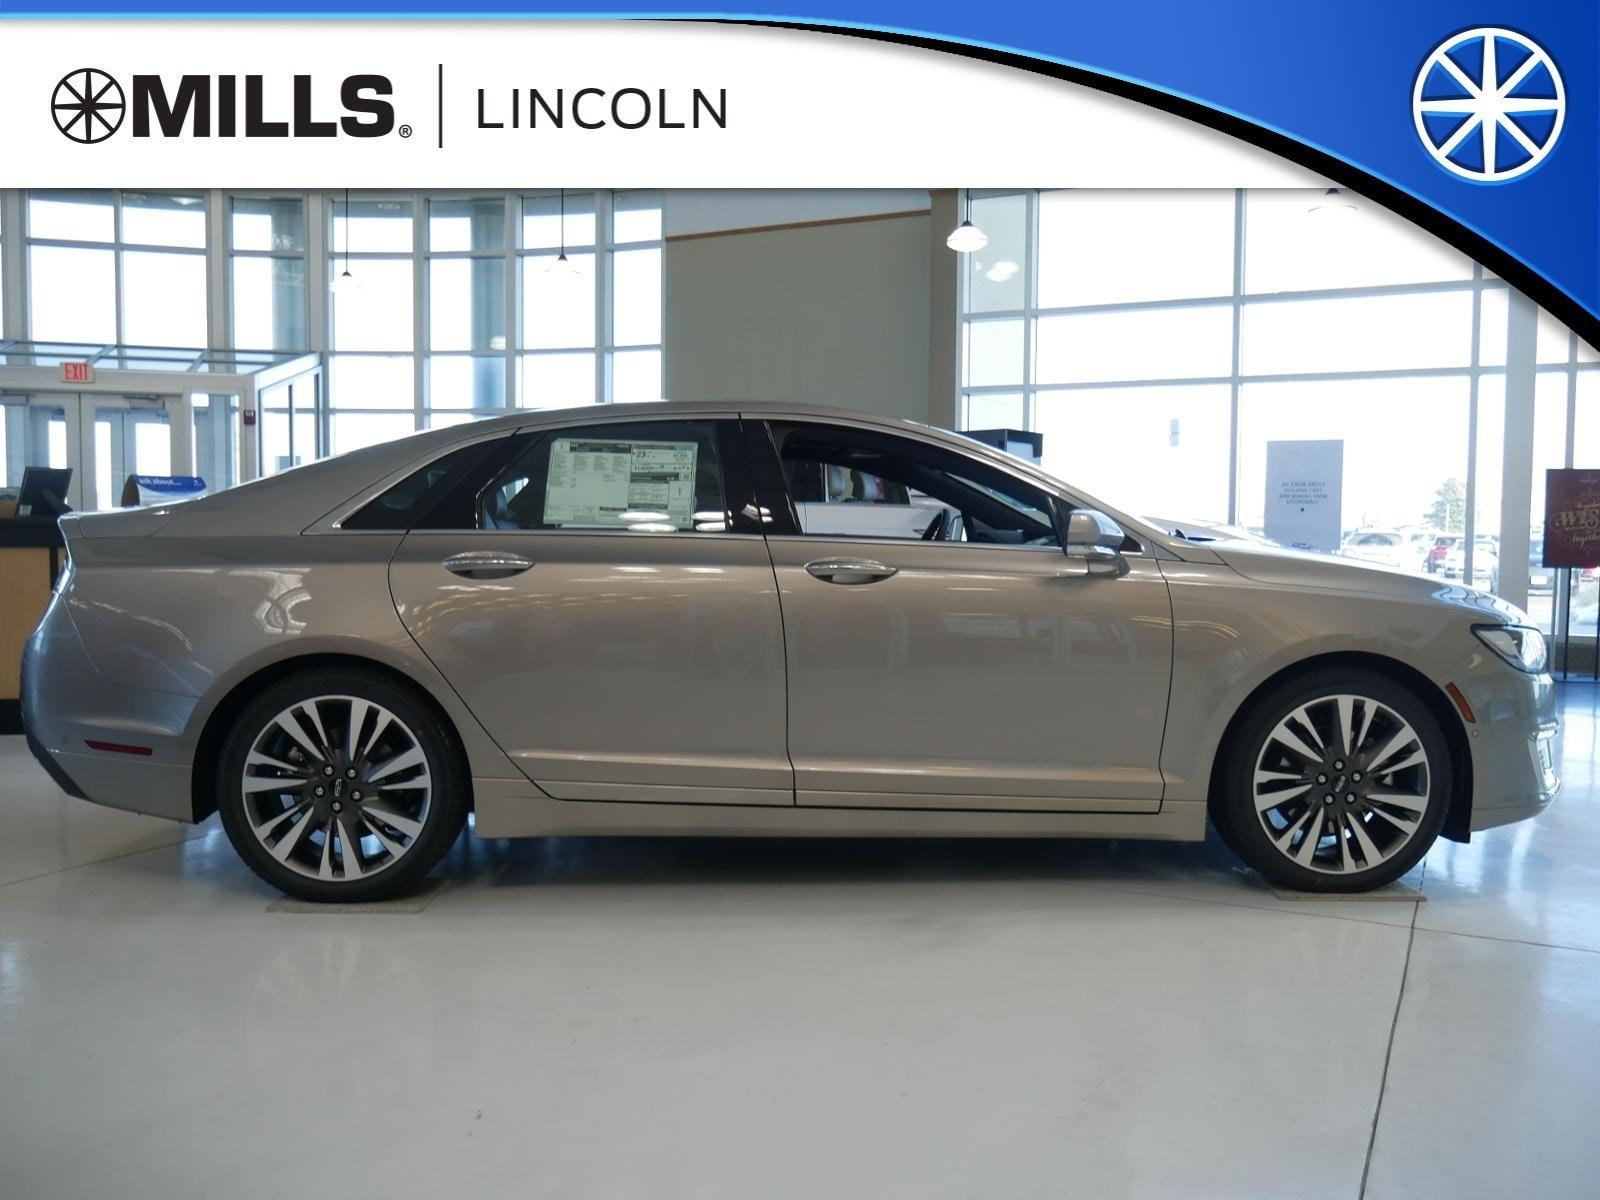 2019 Lincoln MKZ Car